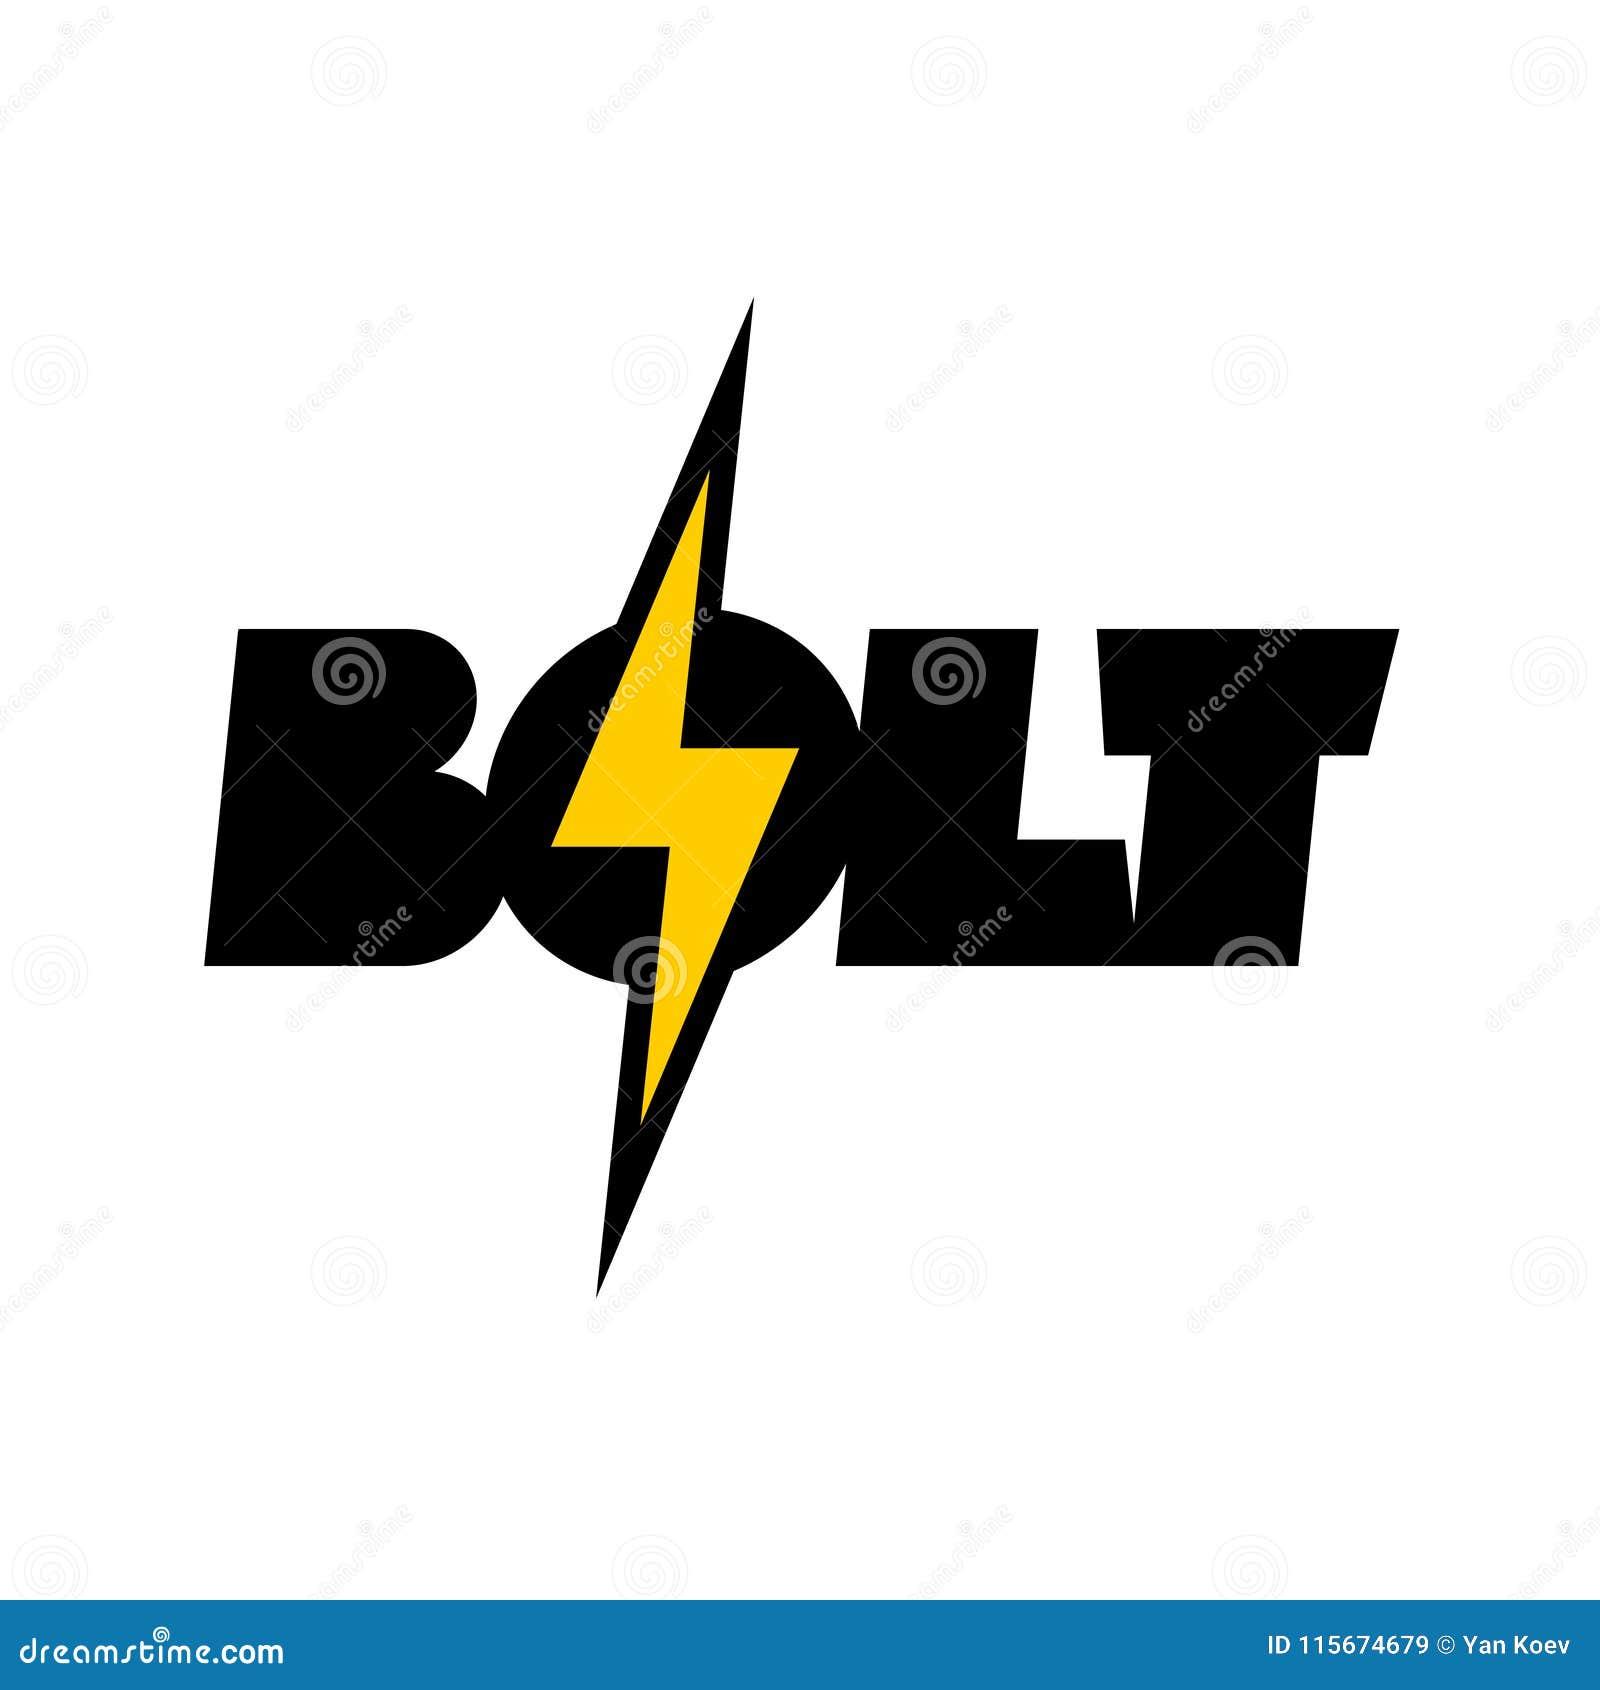 lightning bolt symbol stock photos 189 images